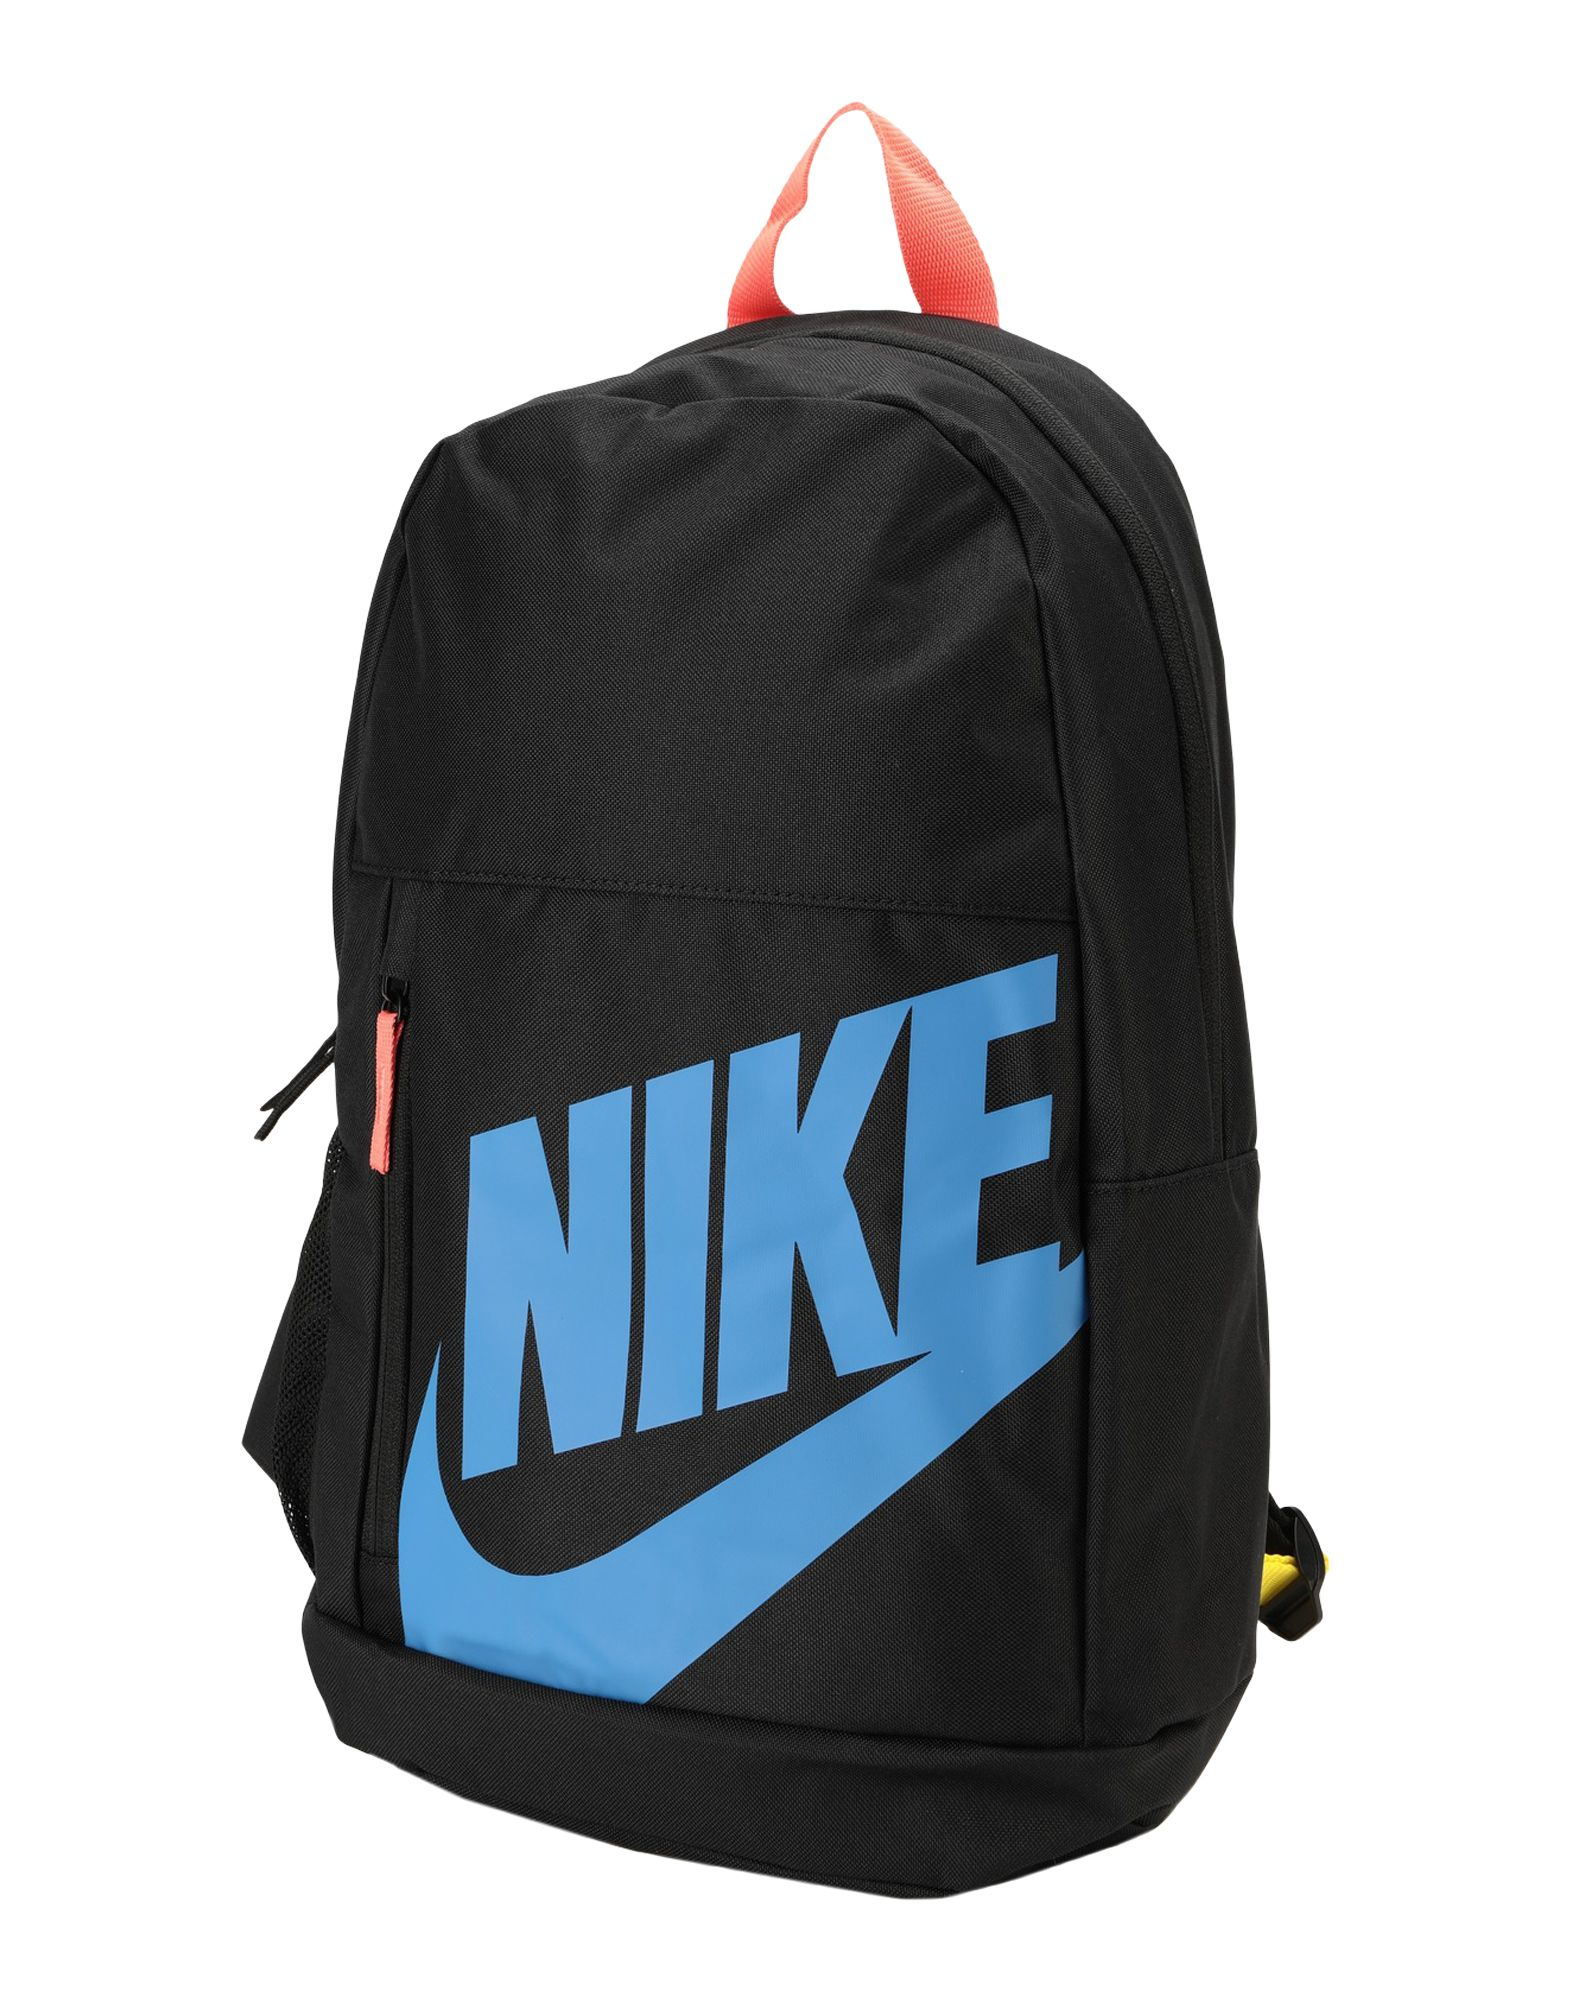 NIKE Рюкзаки и сумки на пояс nike бутсы для мальчиков nike vapor 13 academy mds tf размер 34